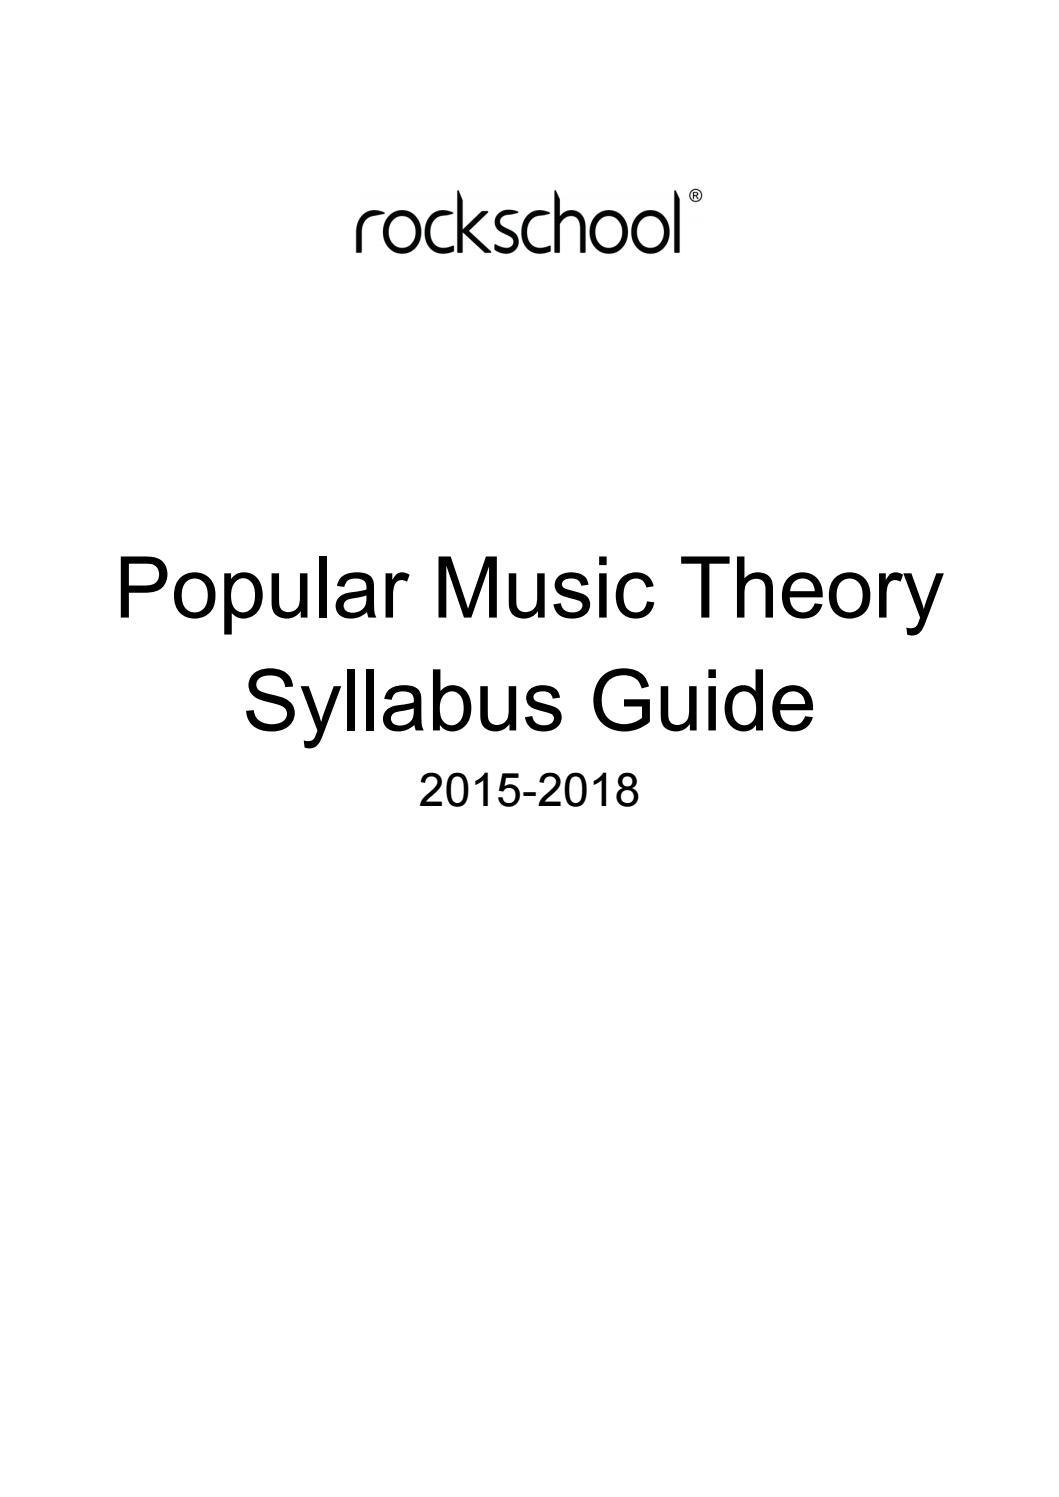 Rockschool popular music theory syllabus 2015 18 by Armoni